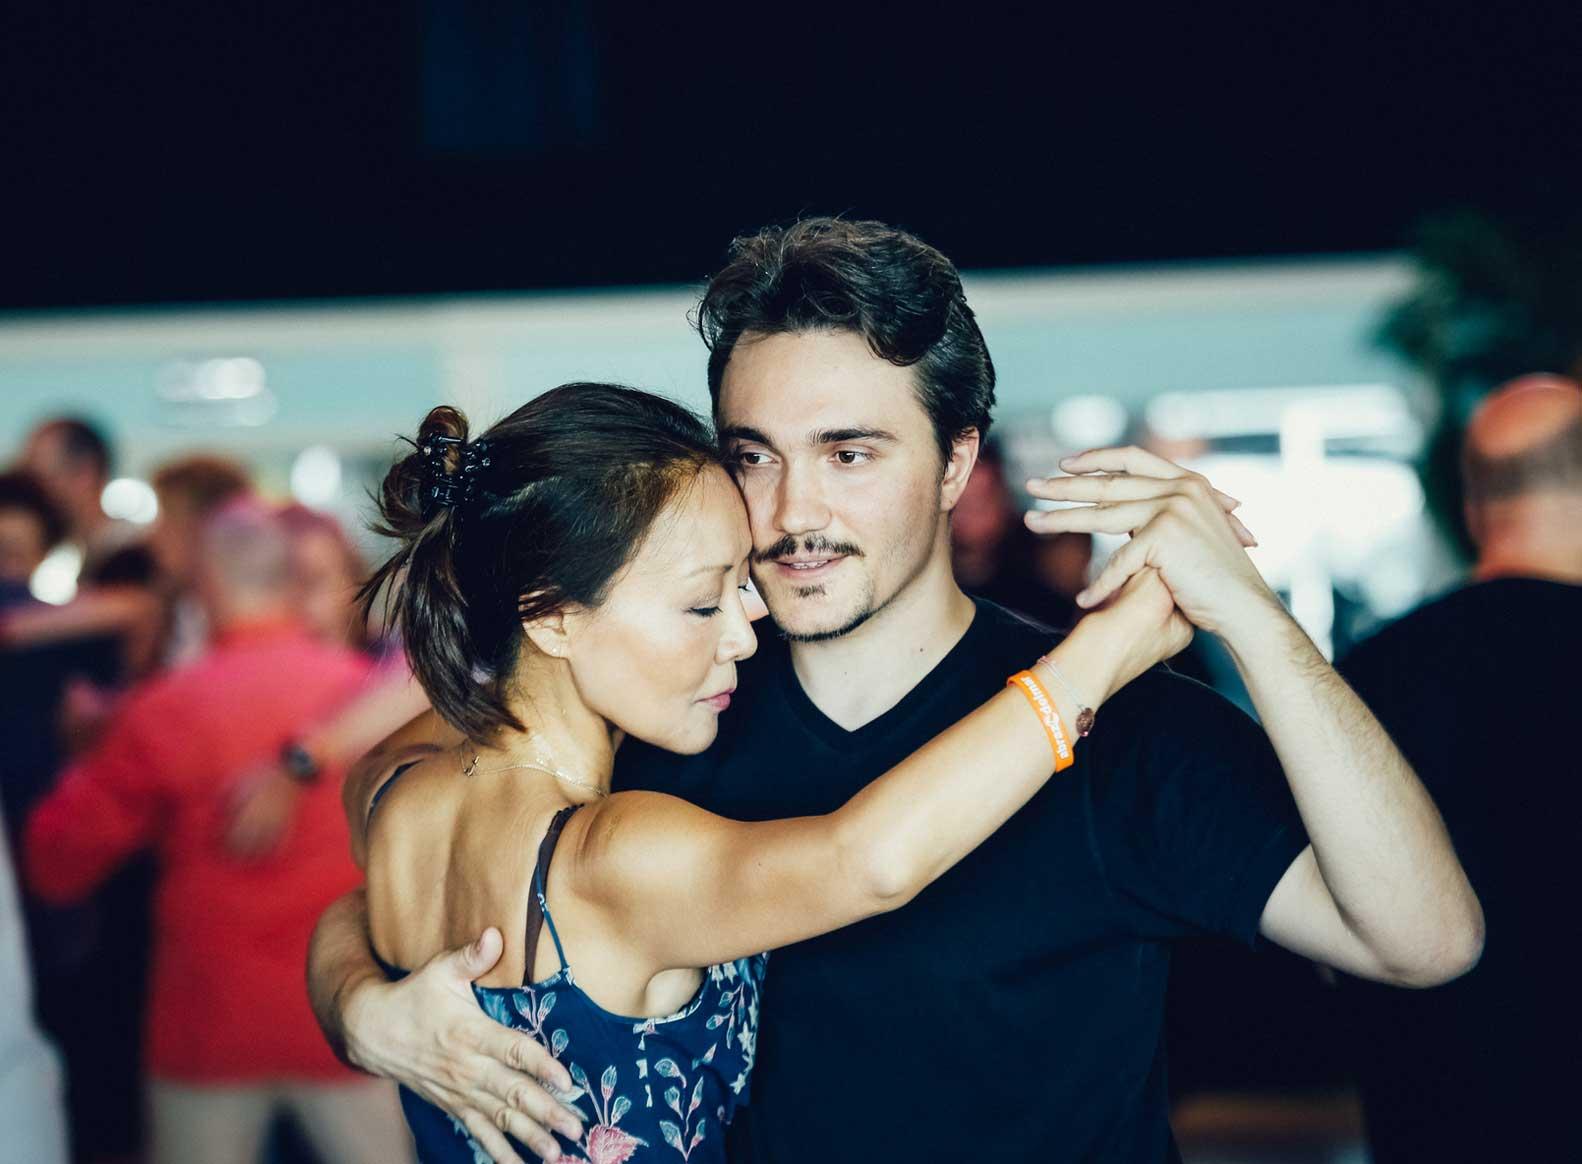 dancers_tango 1